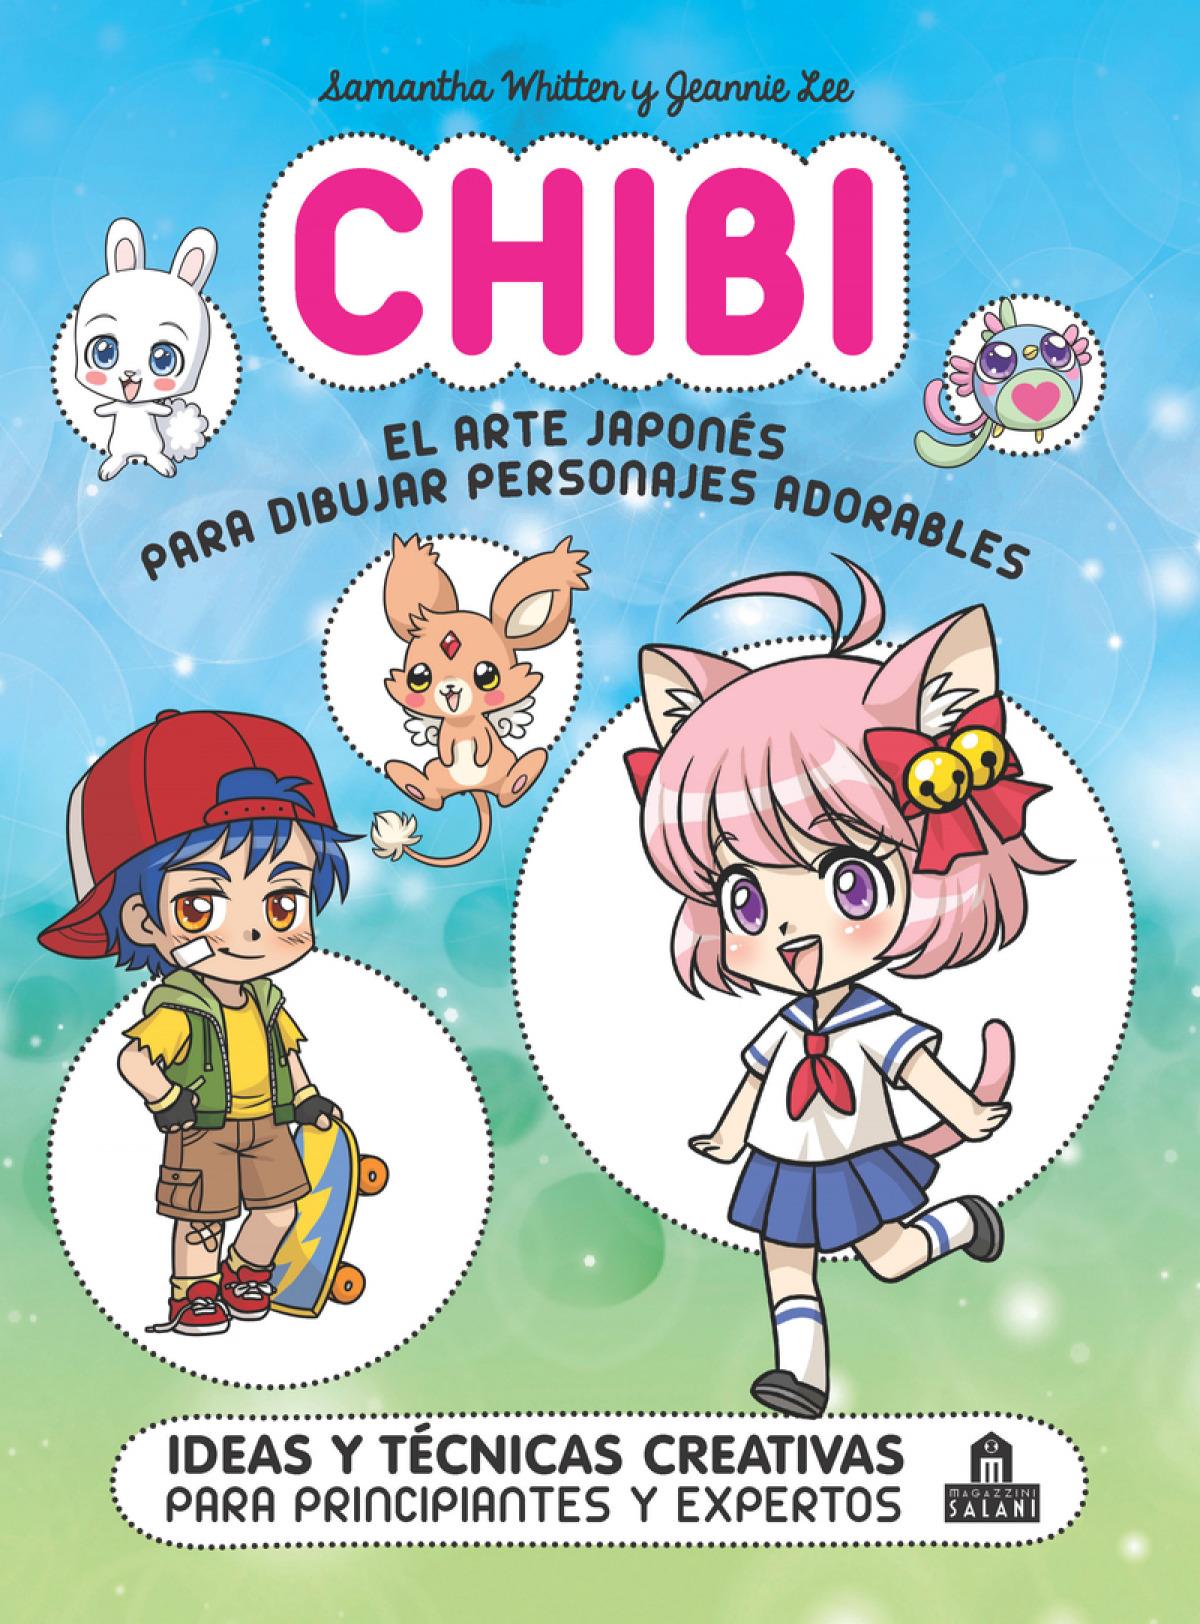 CHIBI El arte japonés para dibujar personajes adorables 9788893679565